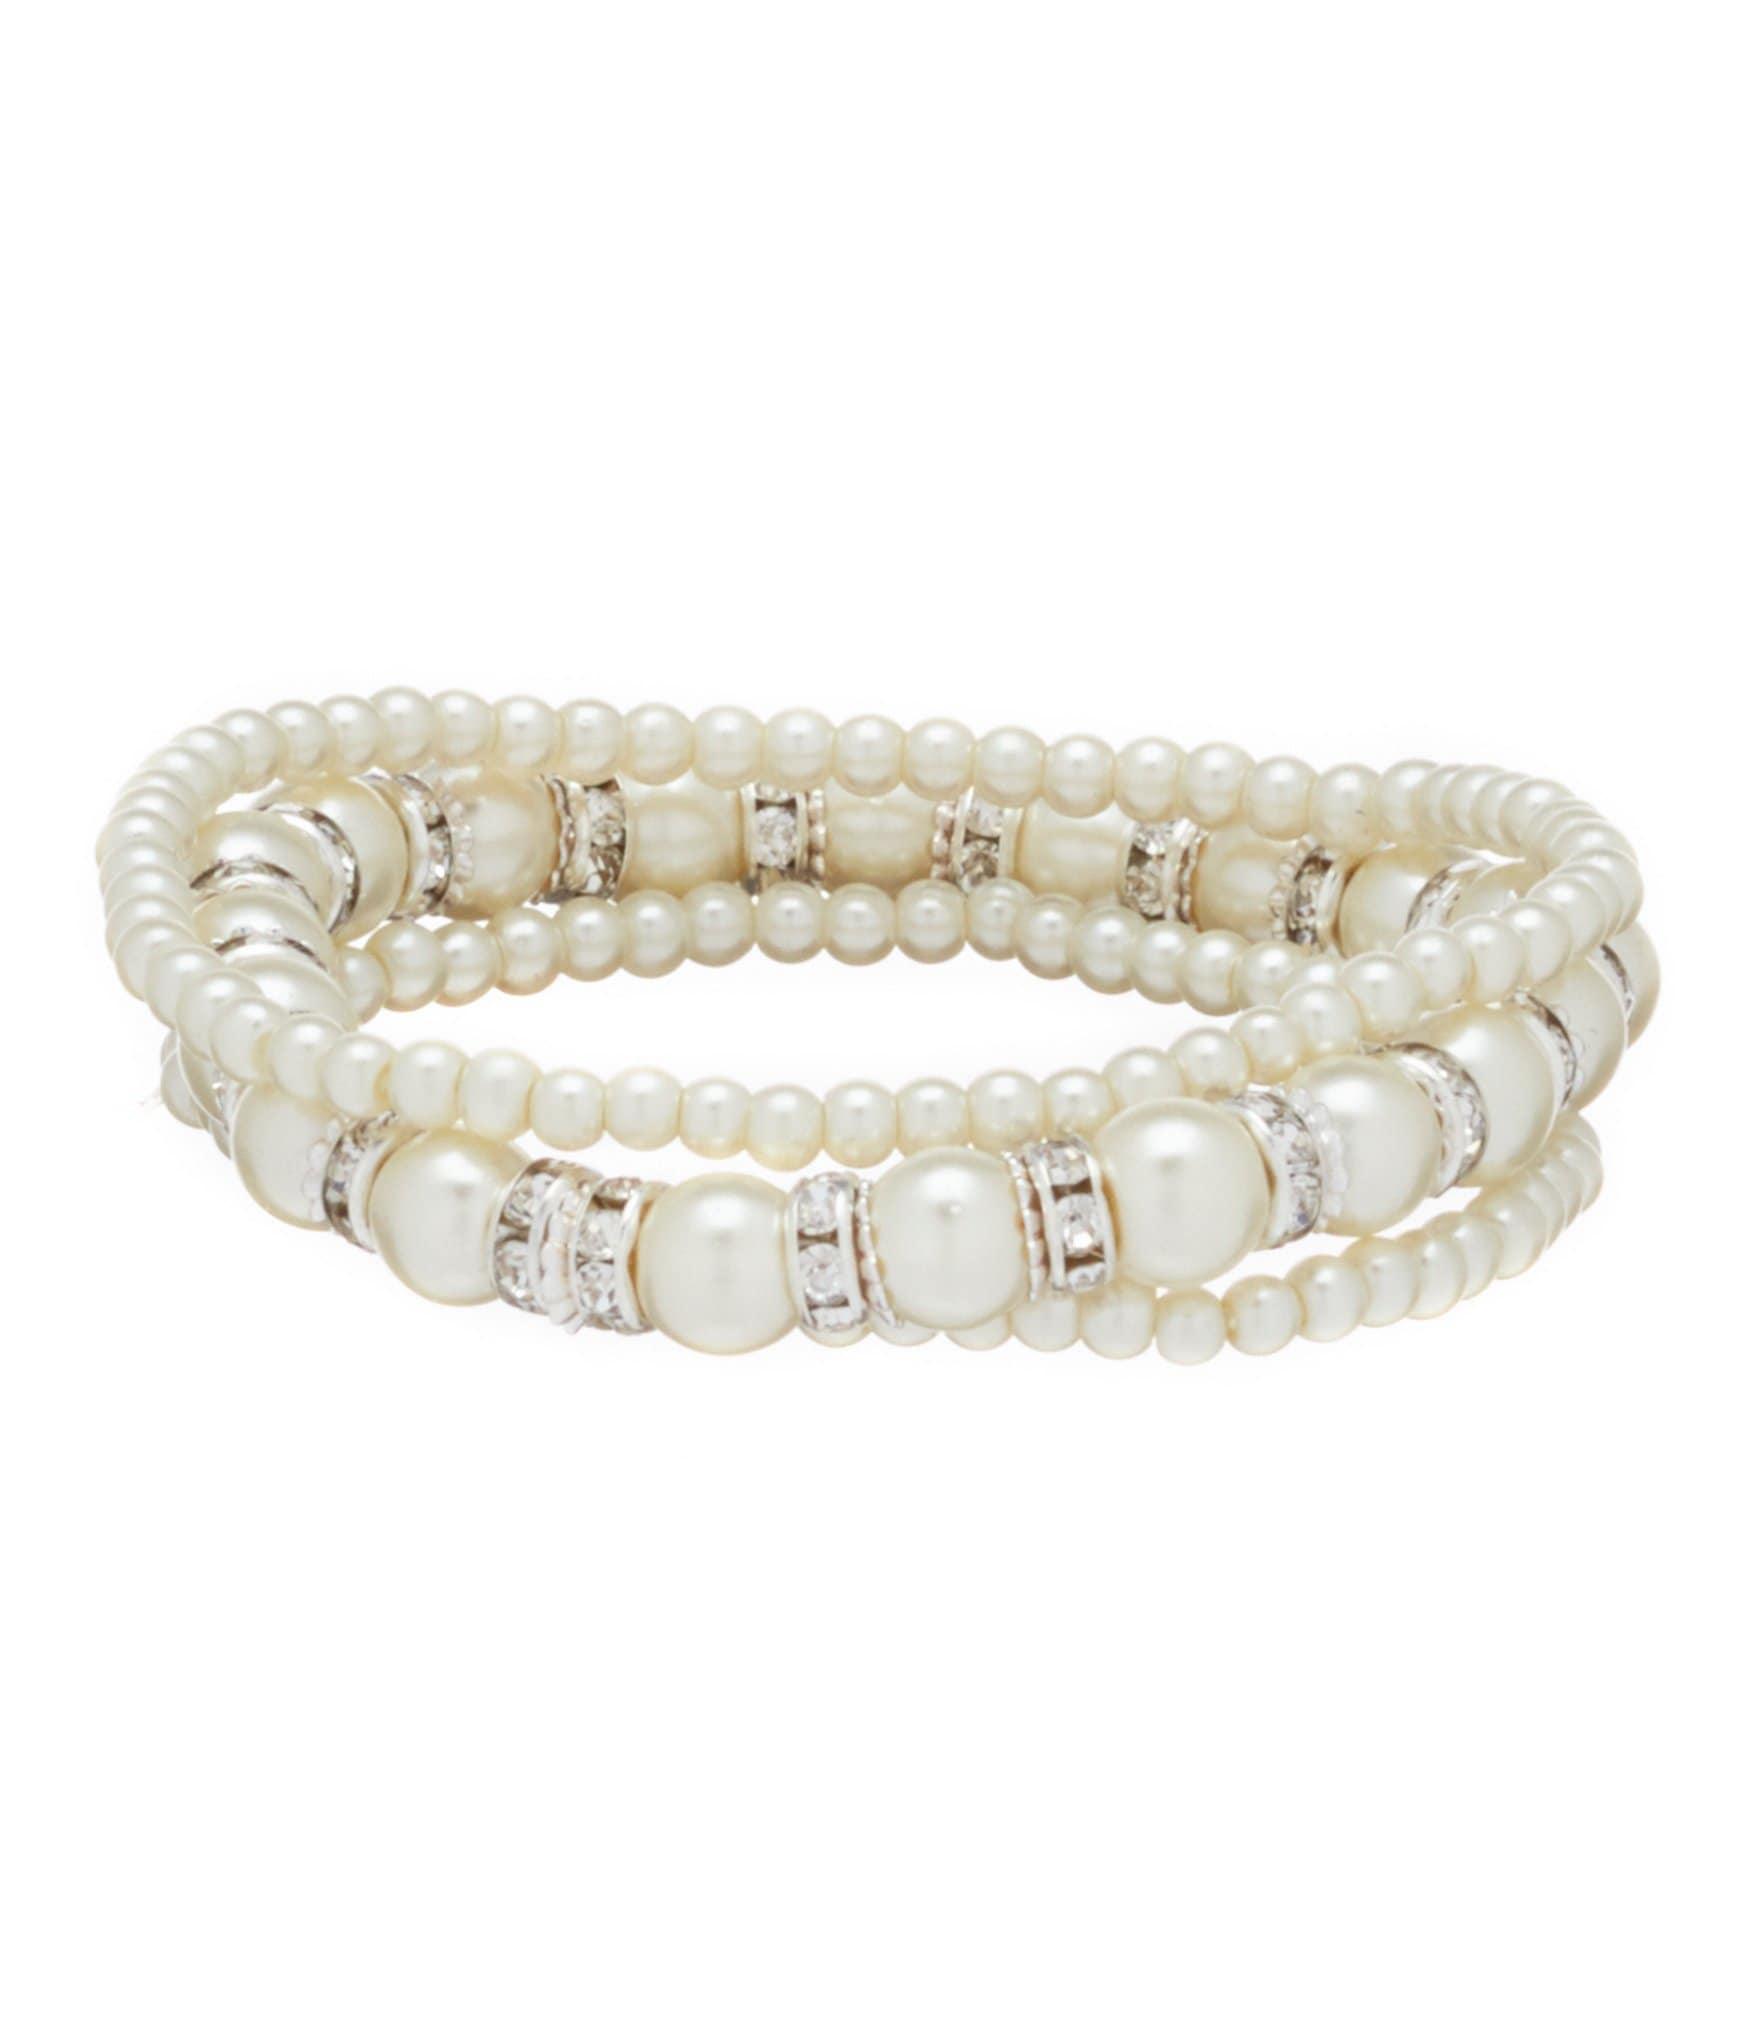 Pandora bracelet dillards - Pandora Bracelet Dillards 4